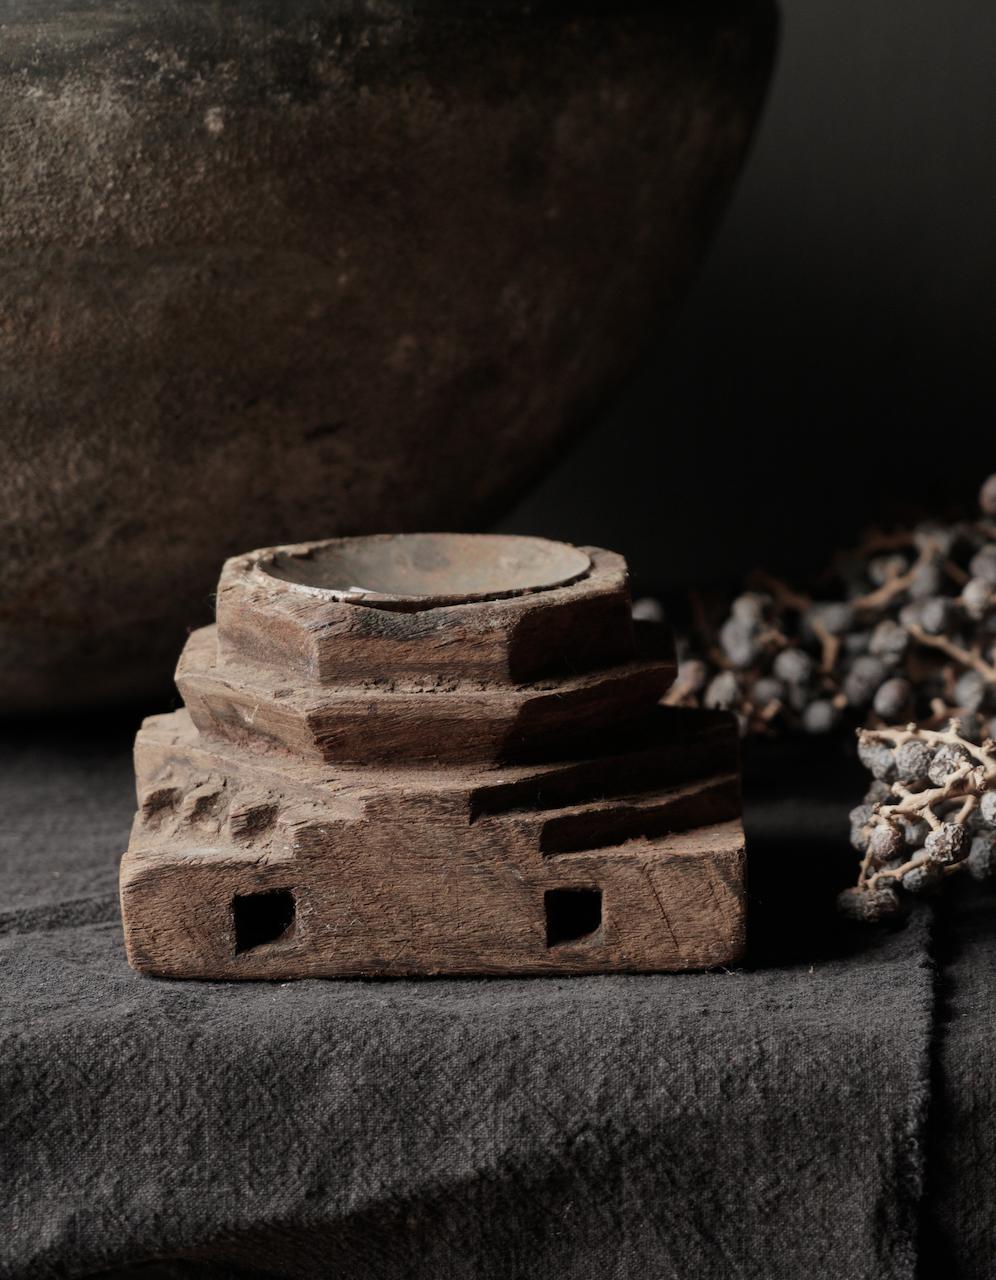 Houten Kandelaars van oud ornament-4